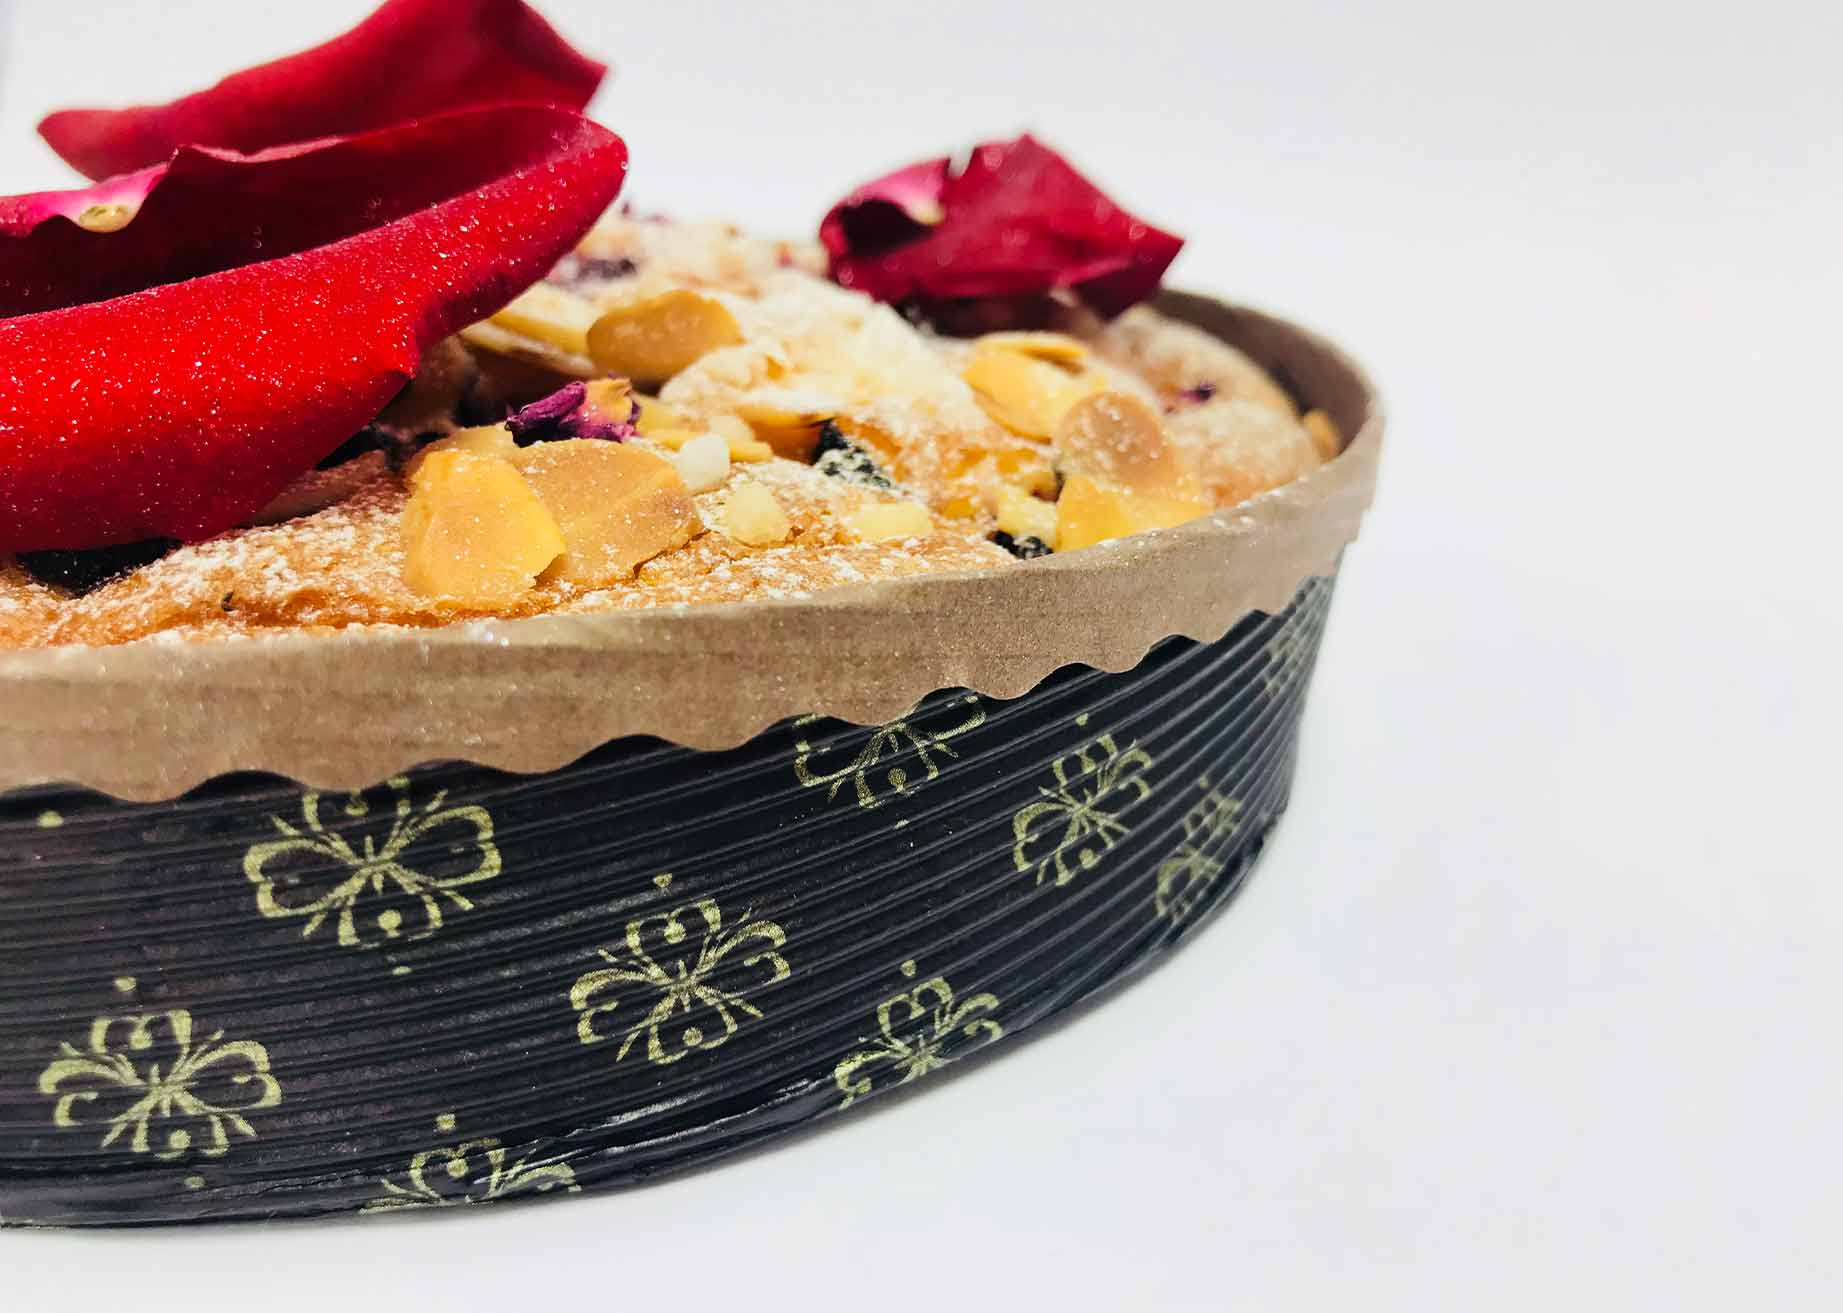 MBB Novacart baking mold and almond tart